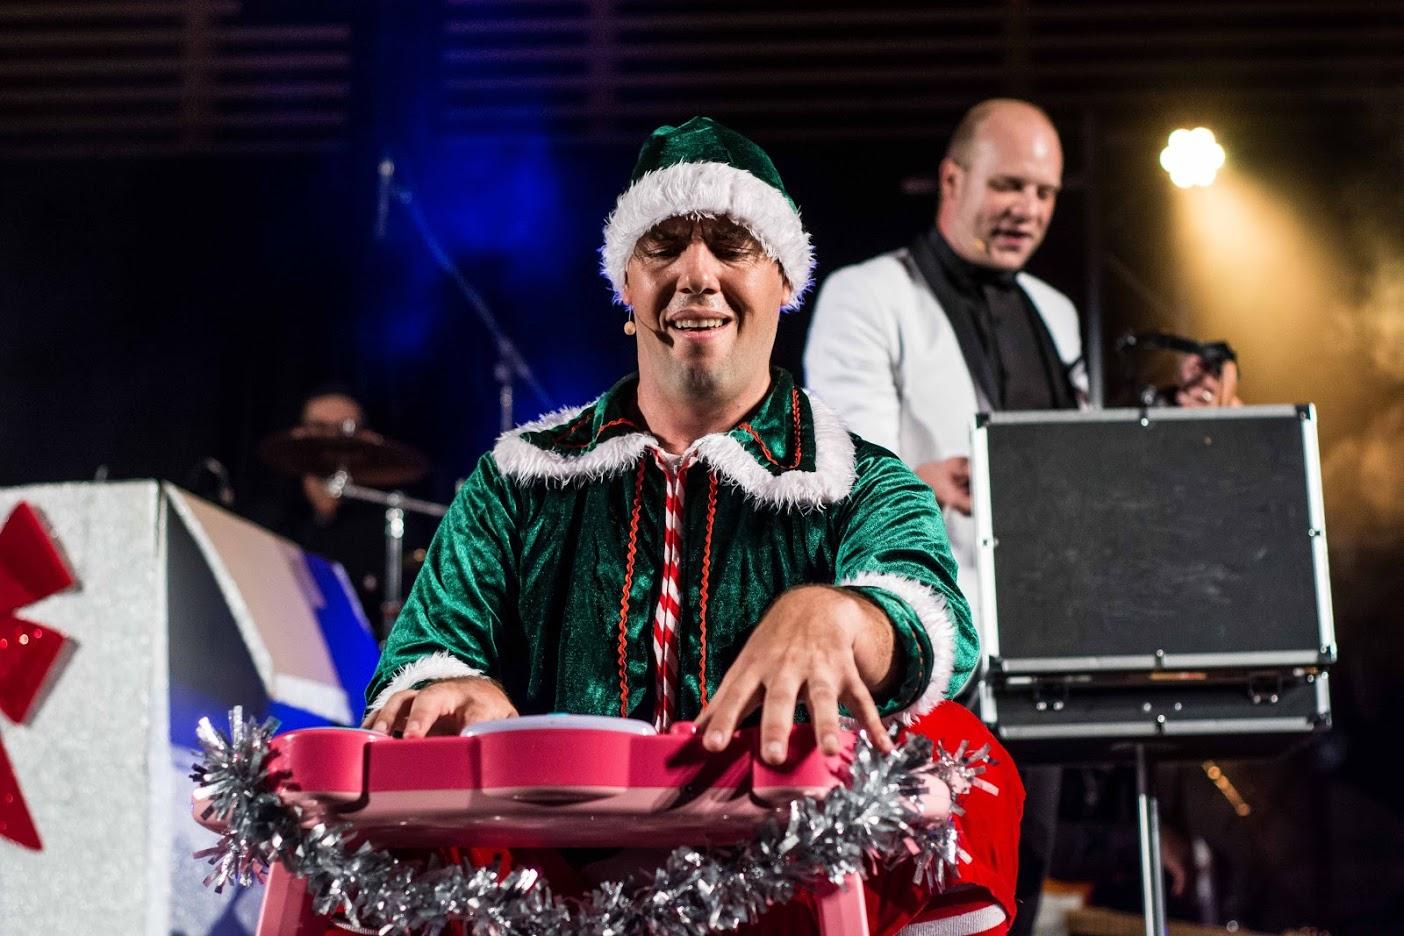 Nicklebys musical elfie